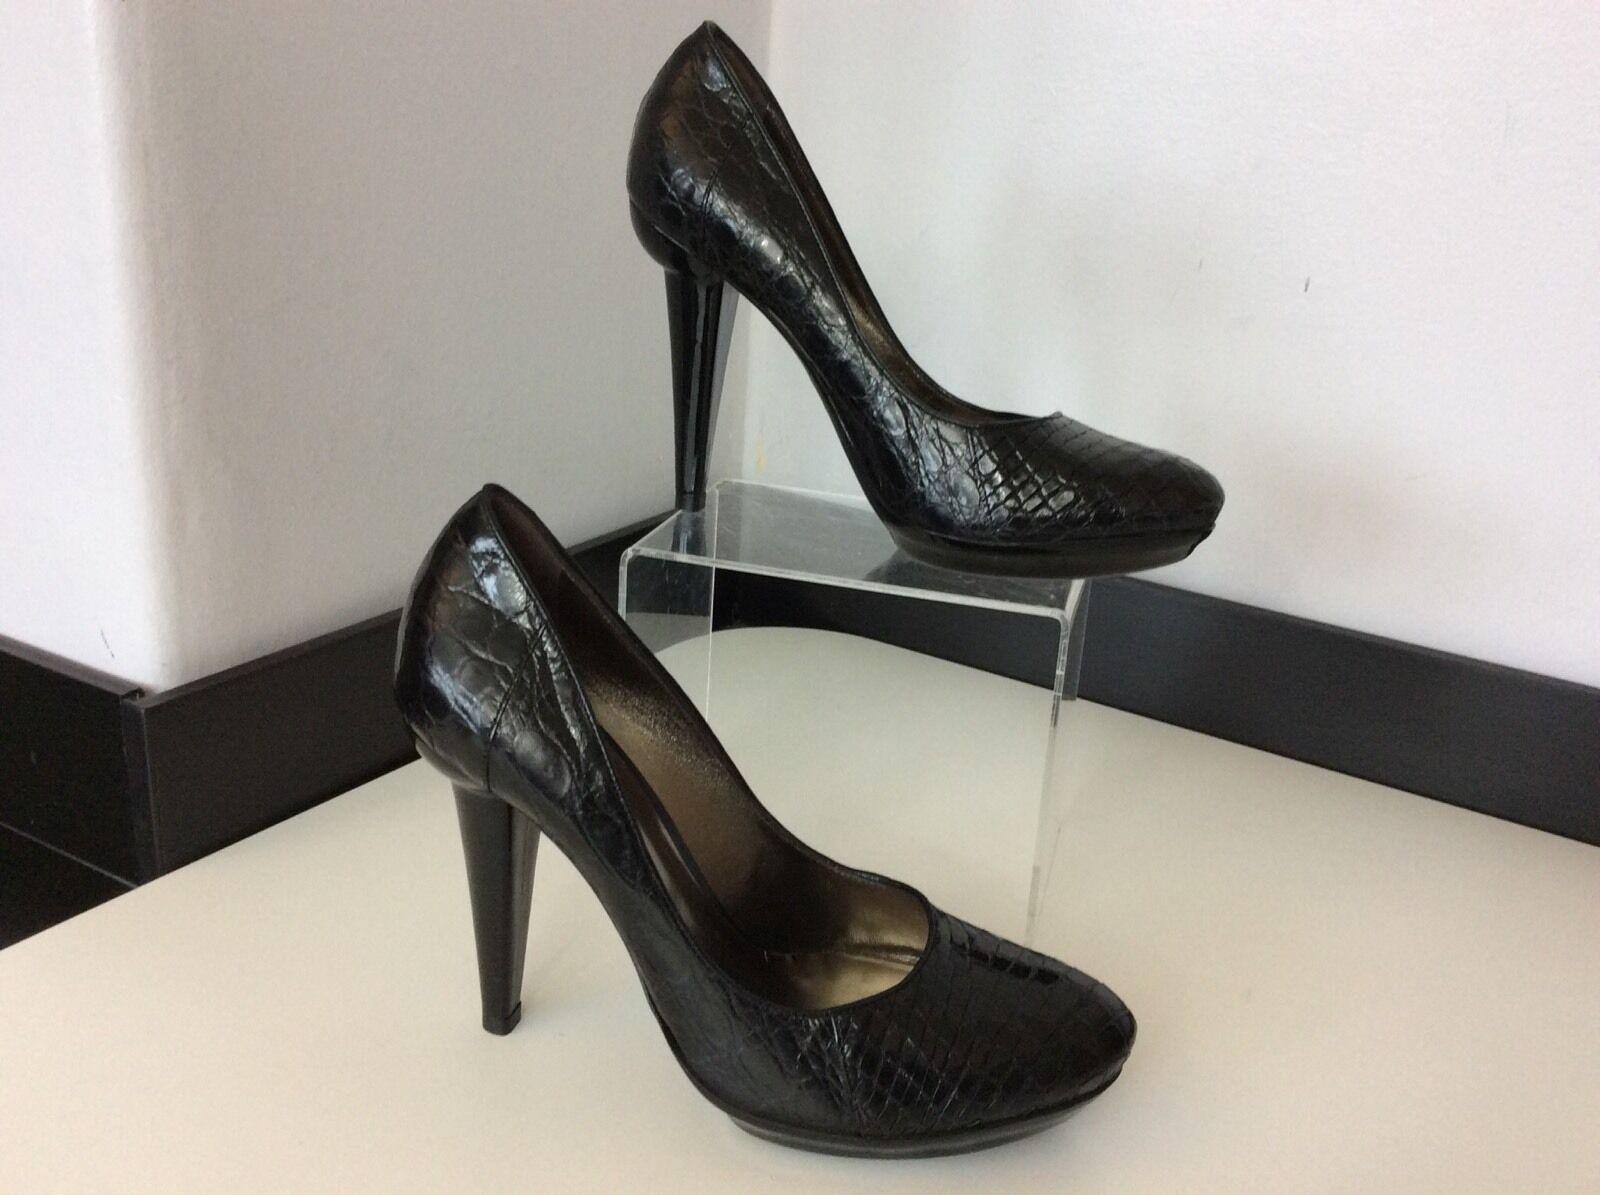 BOTTEGA VENETA NEW schwarz Leder Schuhes Größe Heels 37 Uk 4 Bnwob  Court Heels Größe d8063b